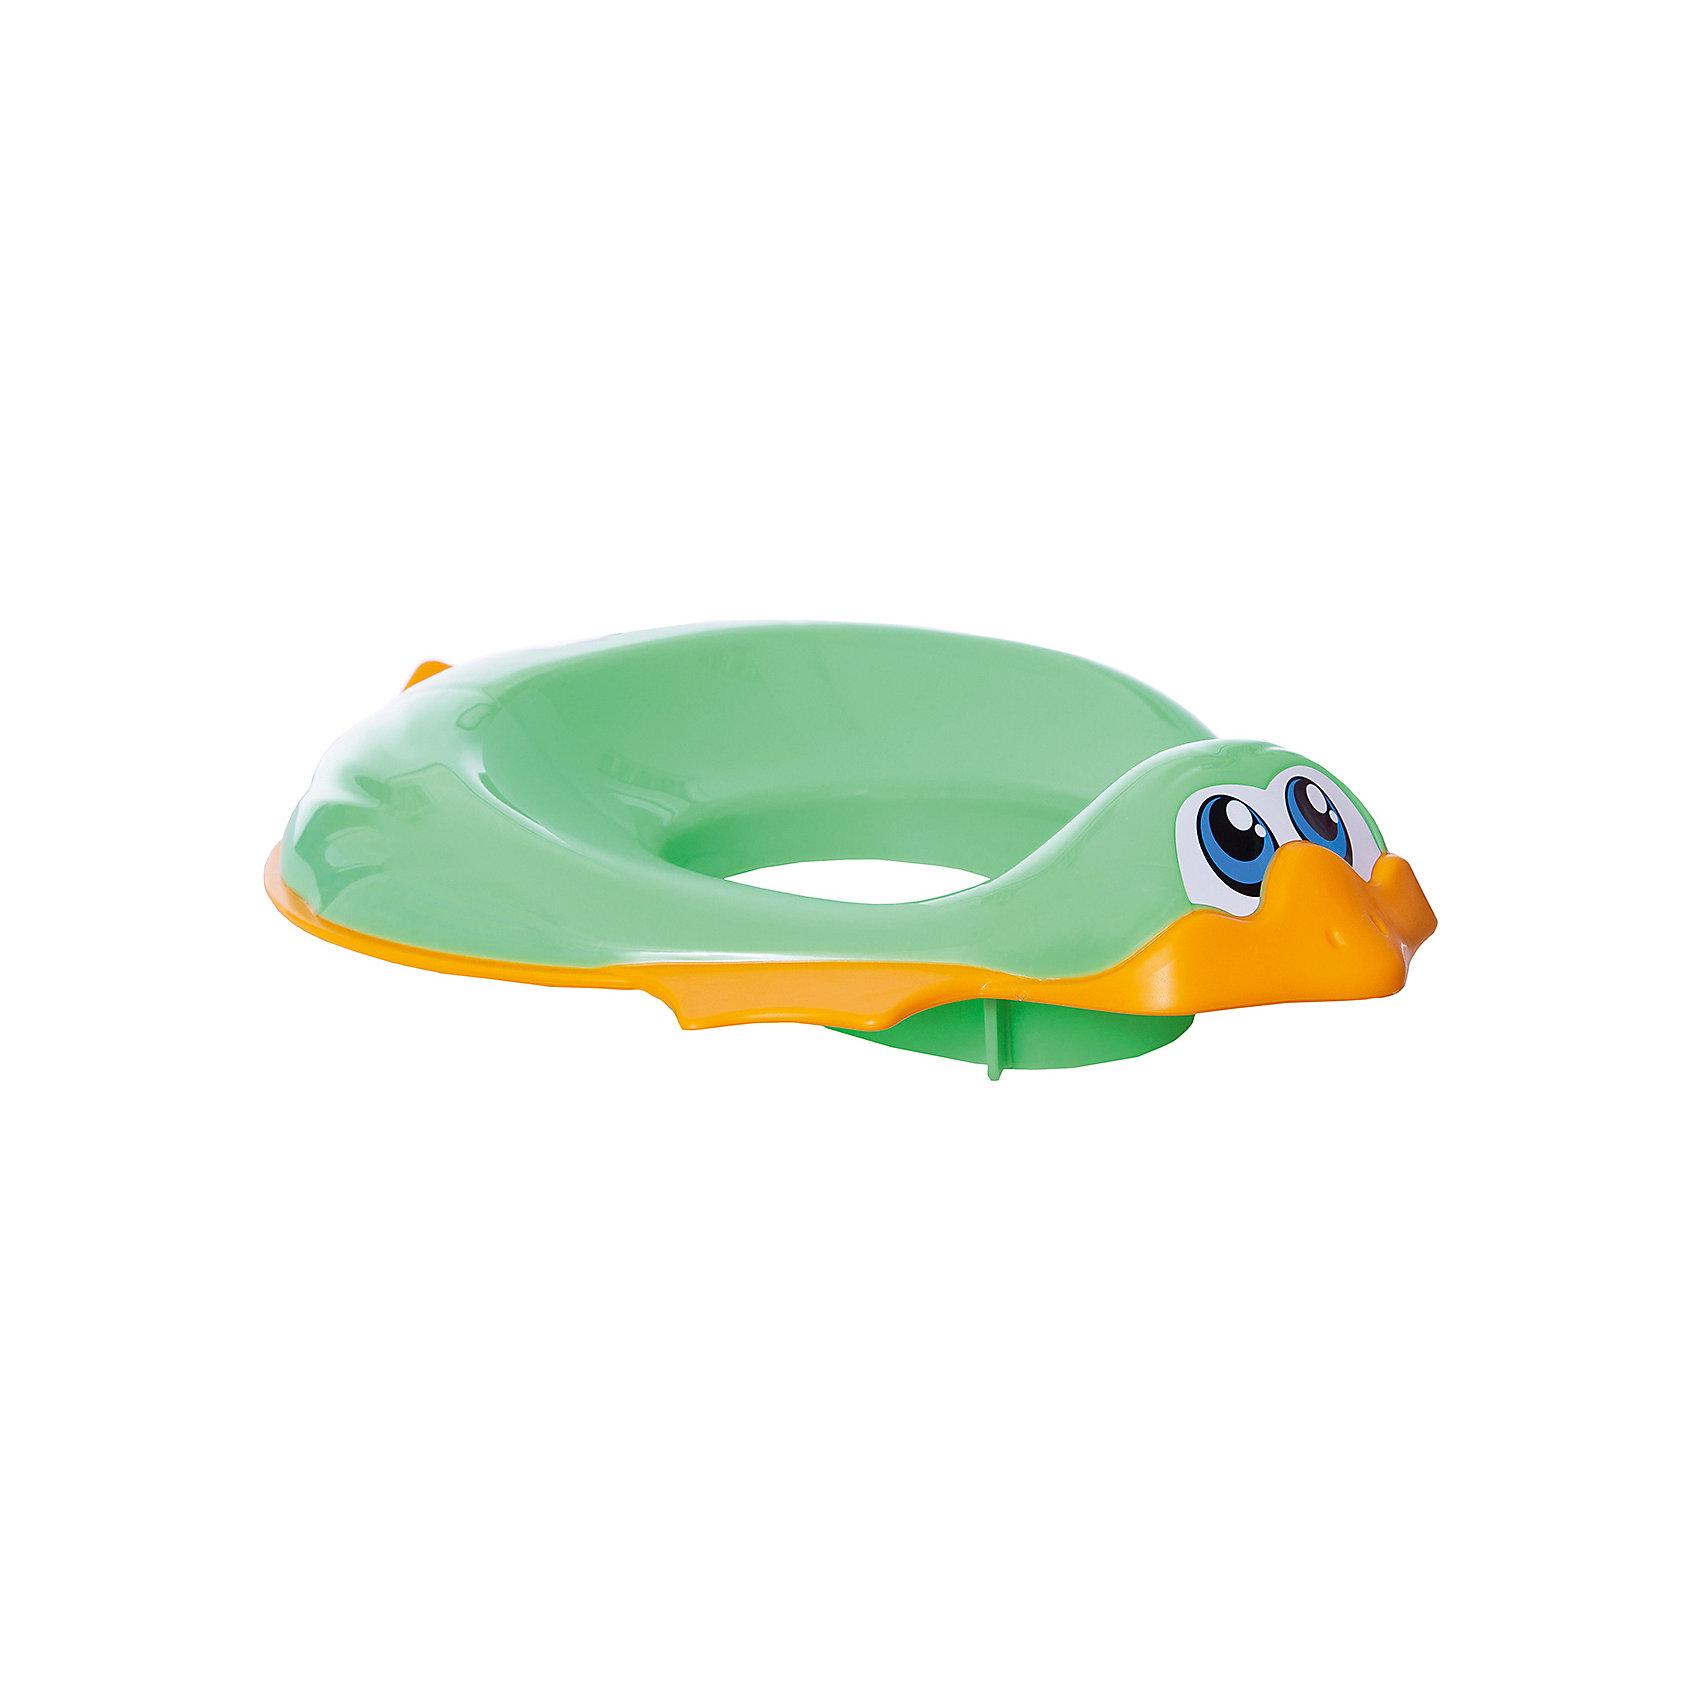 Накладка на унитаз, Ducka, Ok Baby, зеленый